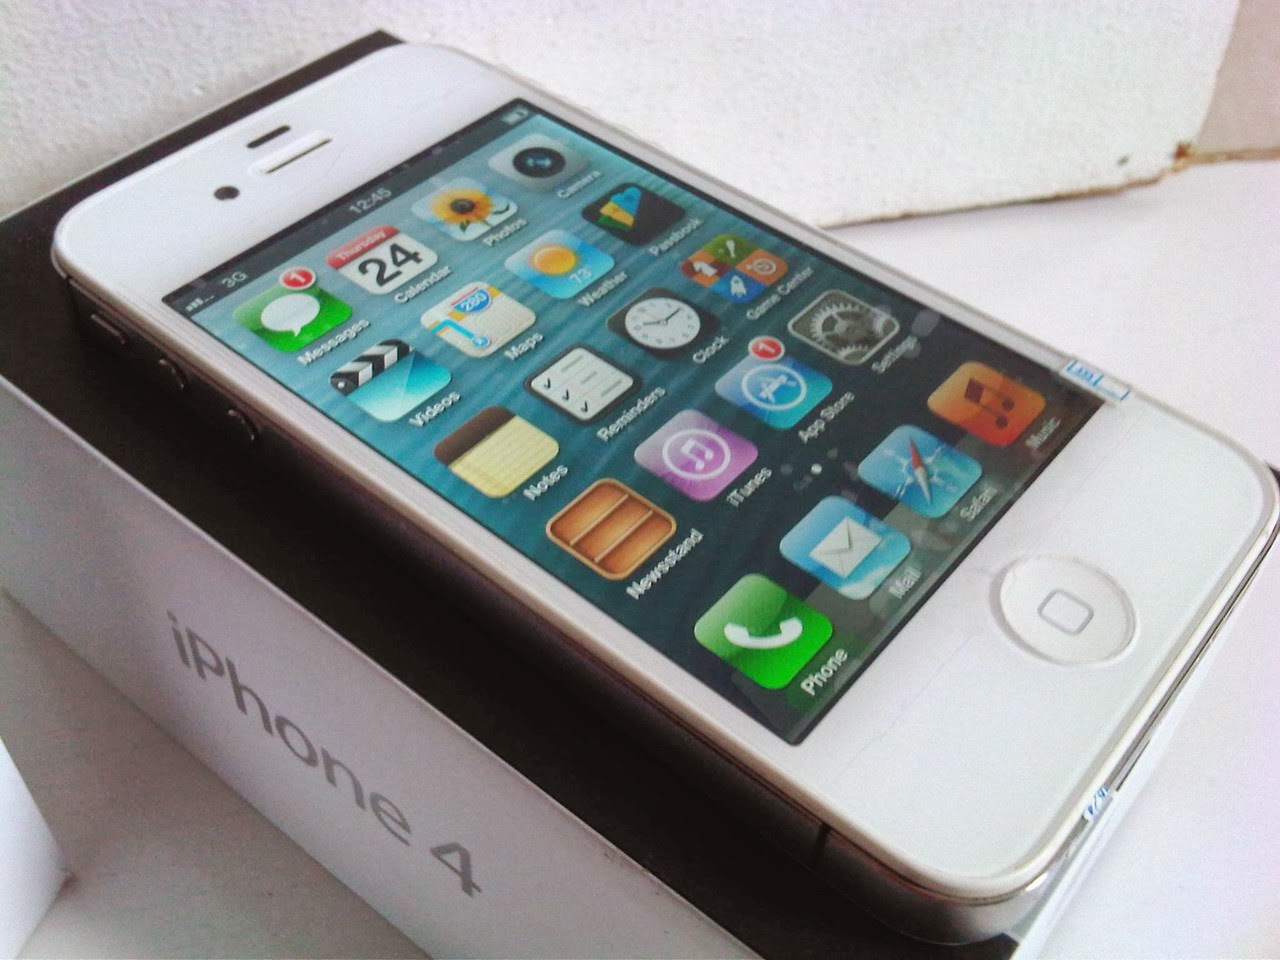 APPLE IPHONE 4 CDMA 8GB WHITE SECOND US MULUS